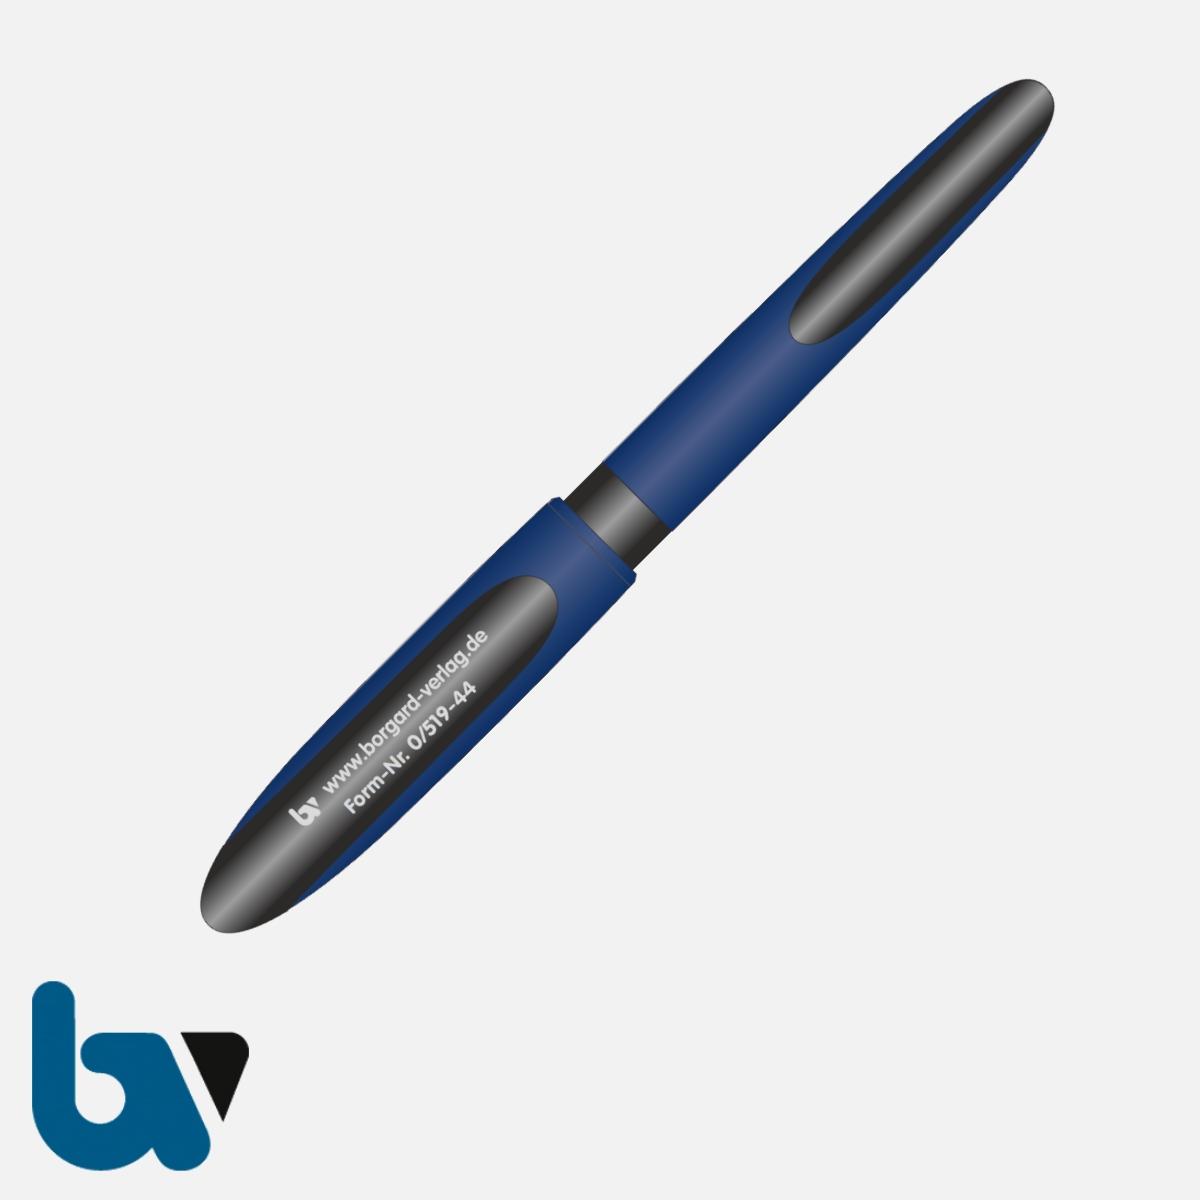 0/519-44 Tintenroller One Business schwarz dokumentenecht 1 | Borgard Verlag GmbH